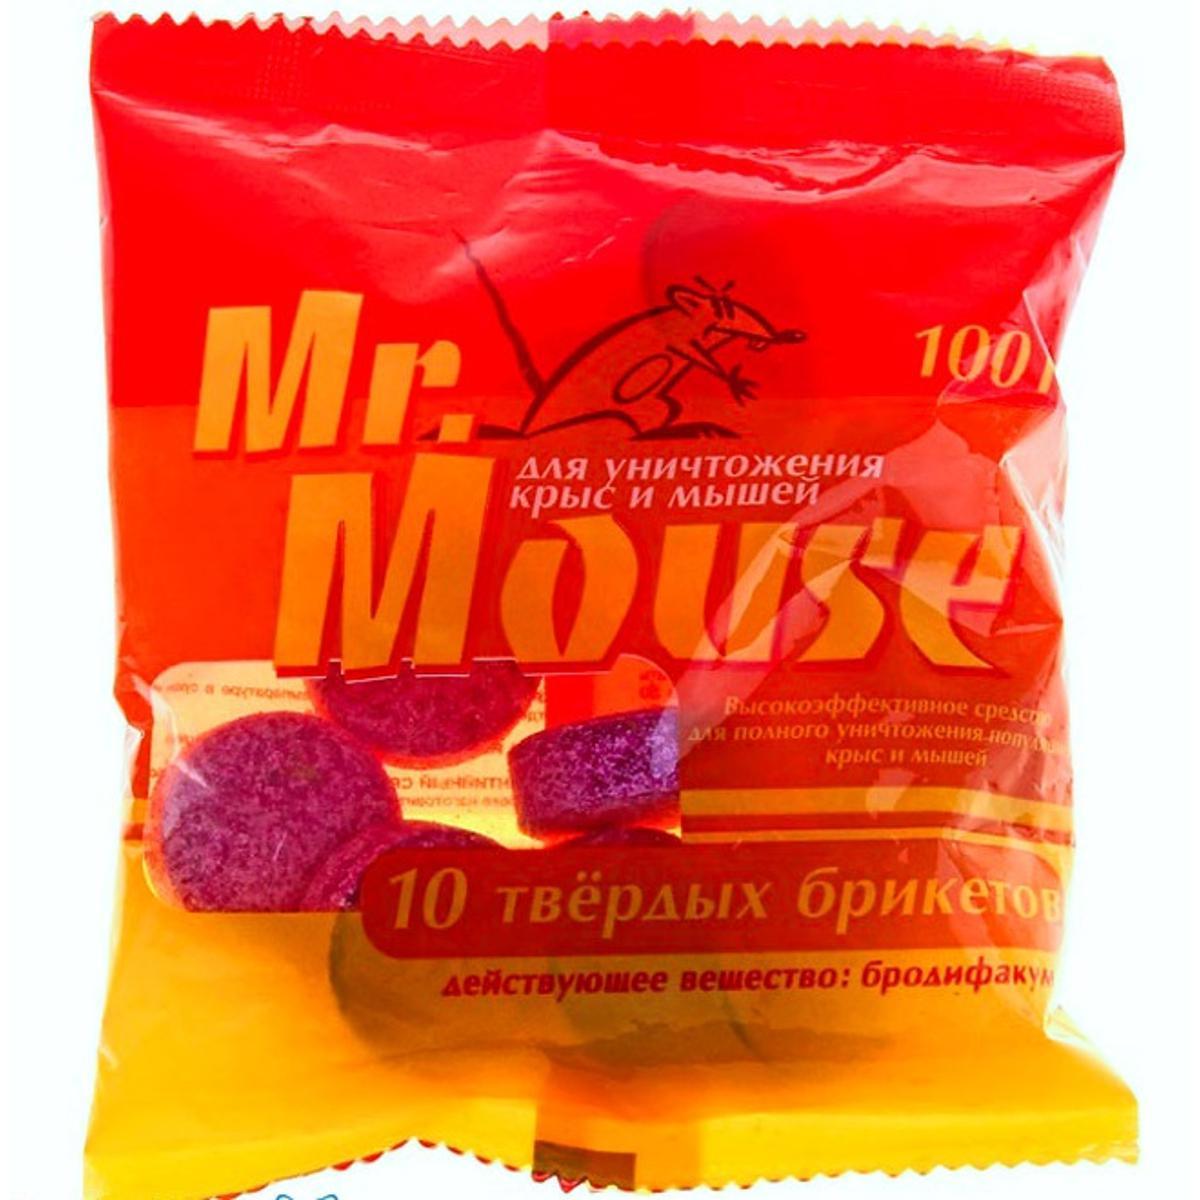 Парафин Mr. mouse СЗ.040004